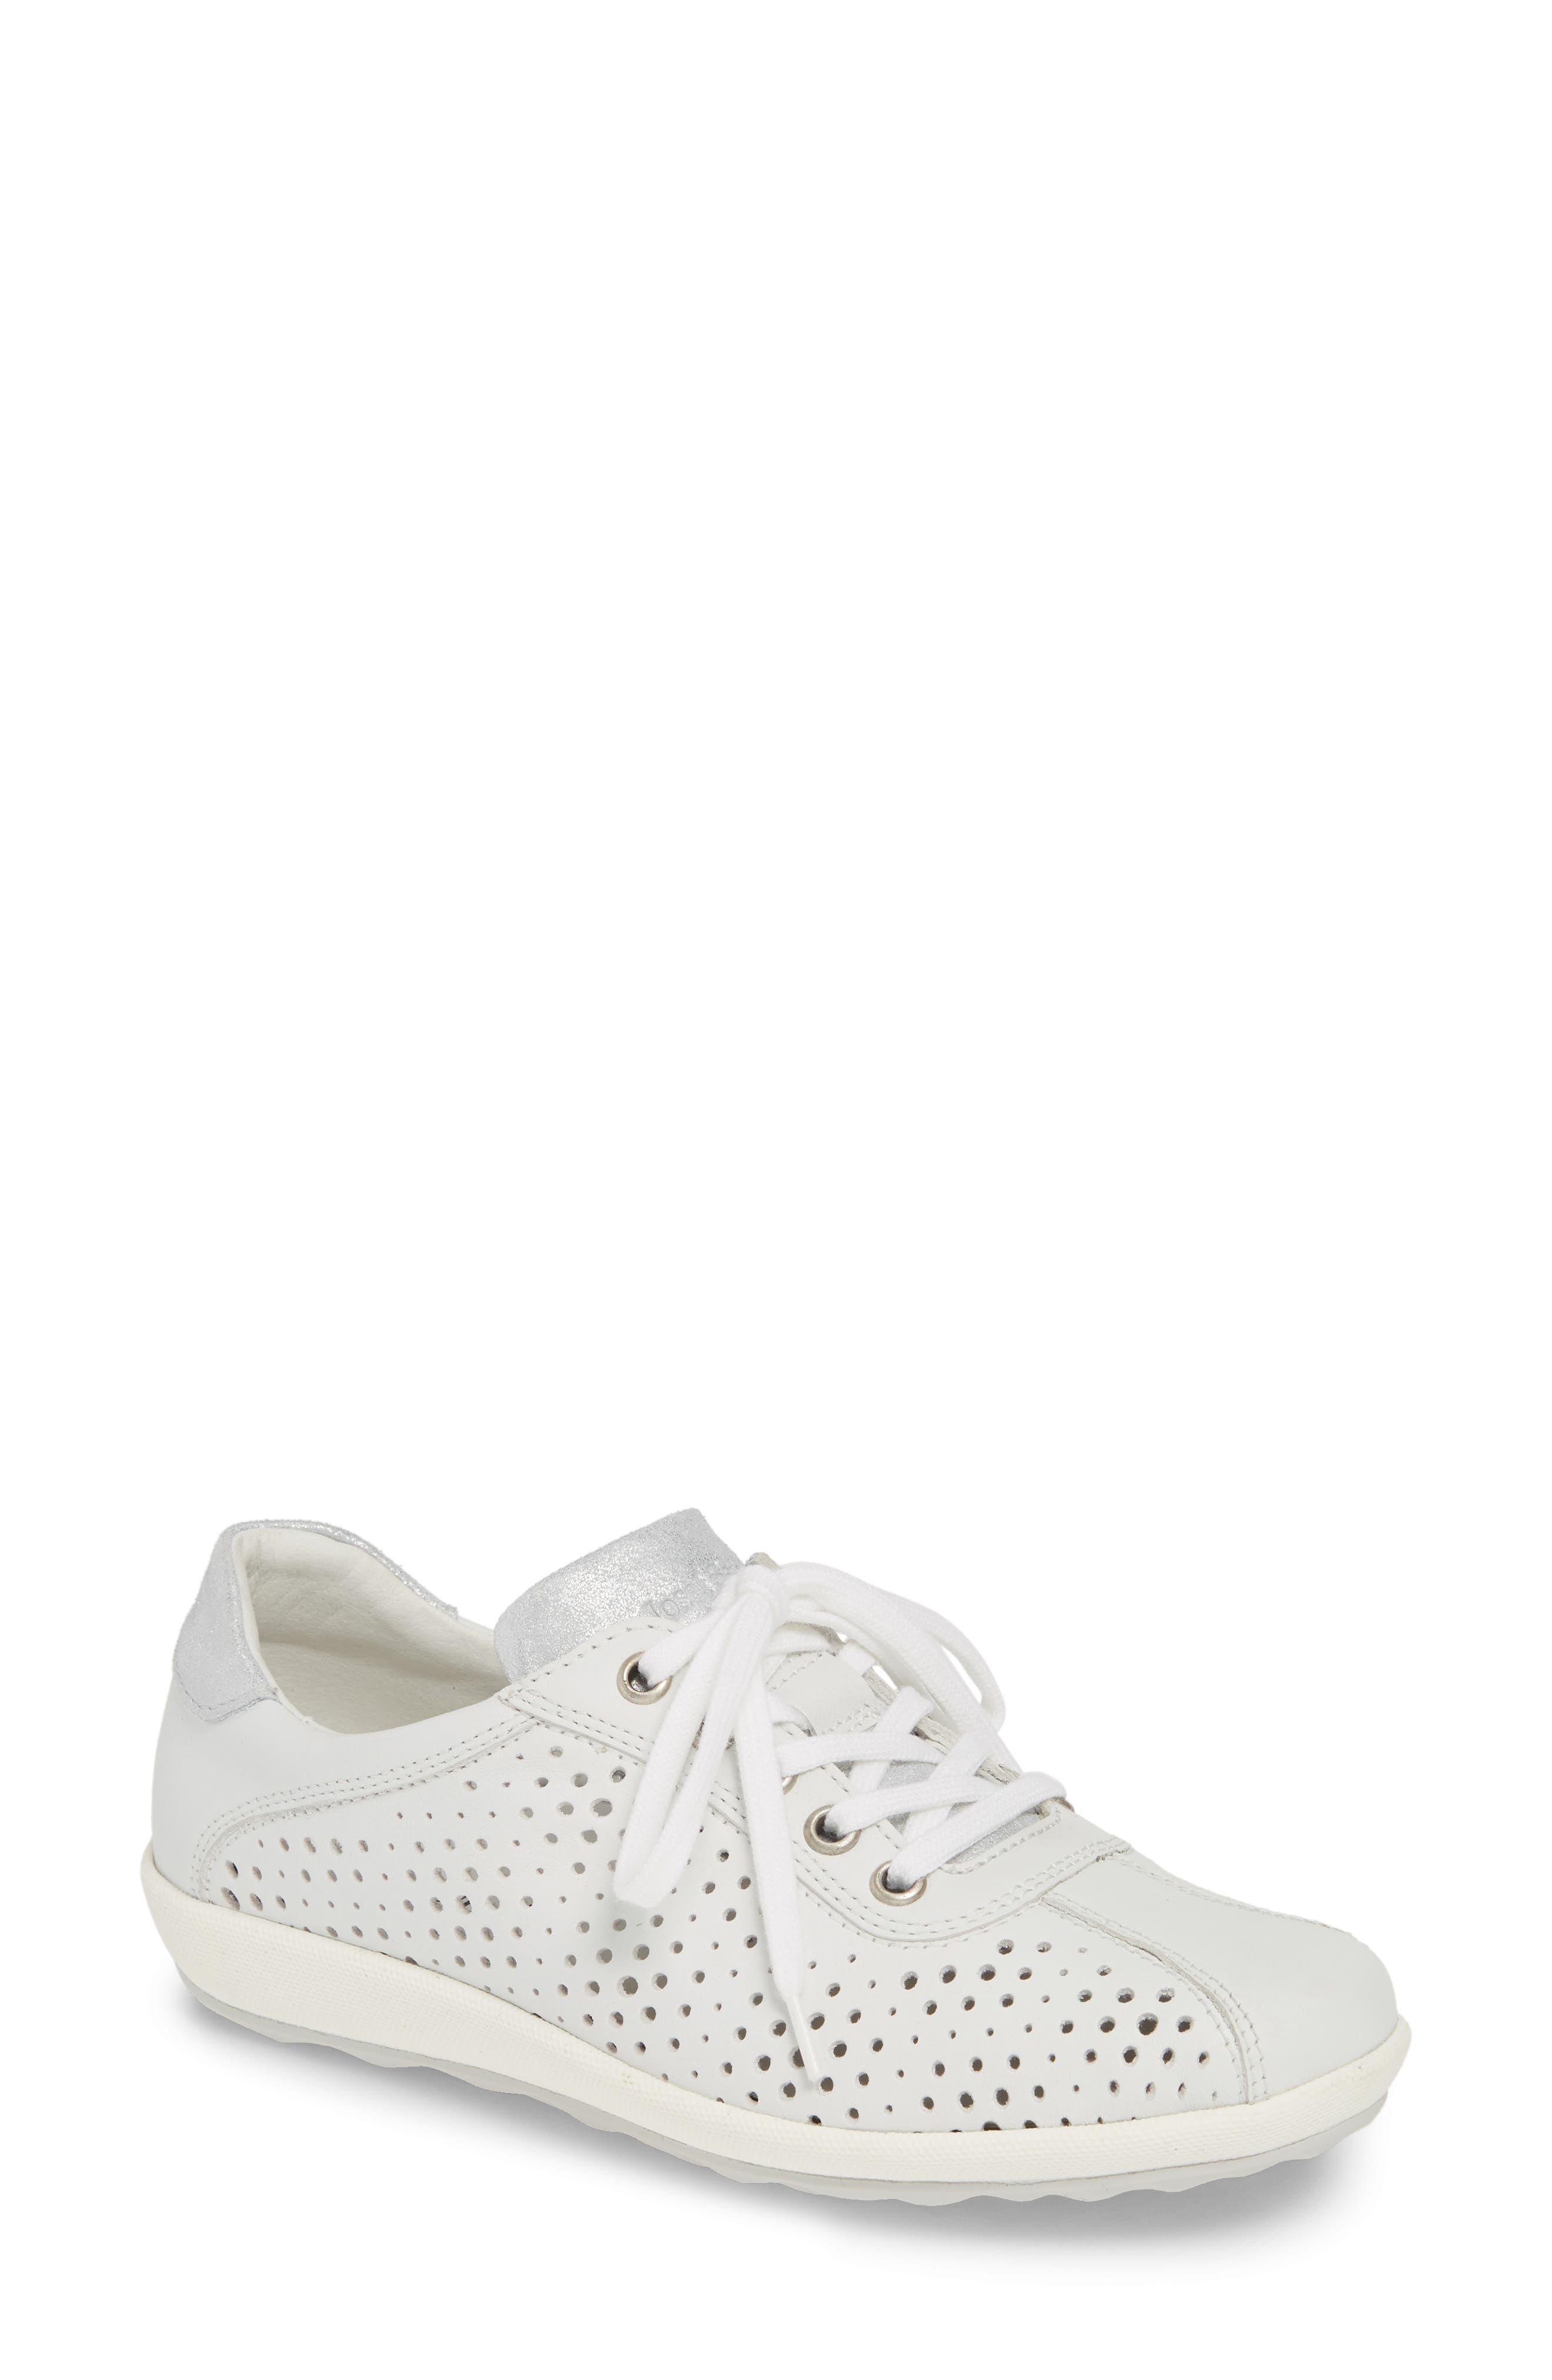 Josef Seibel Viola 09 Sneaker, White